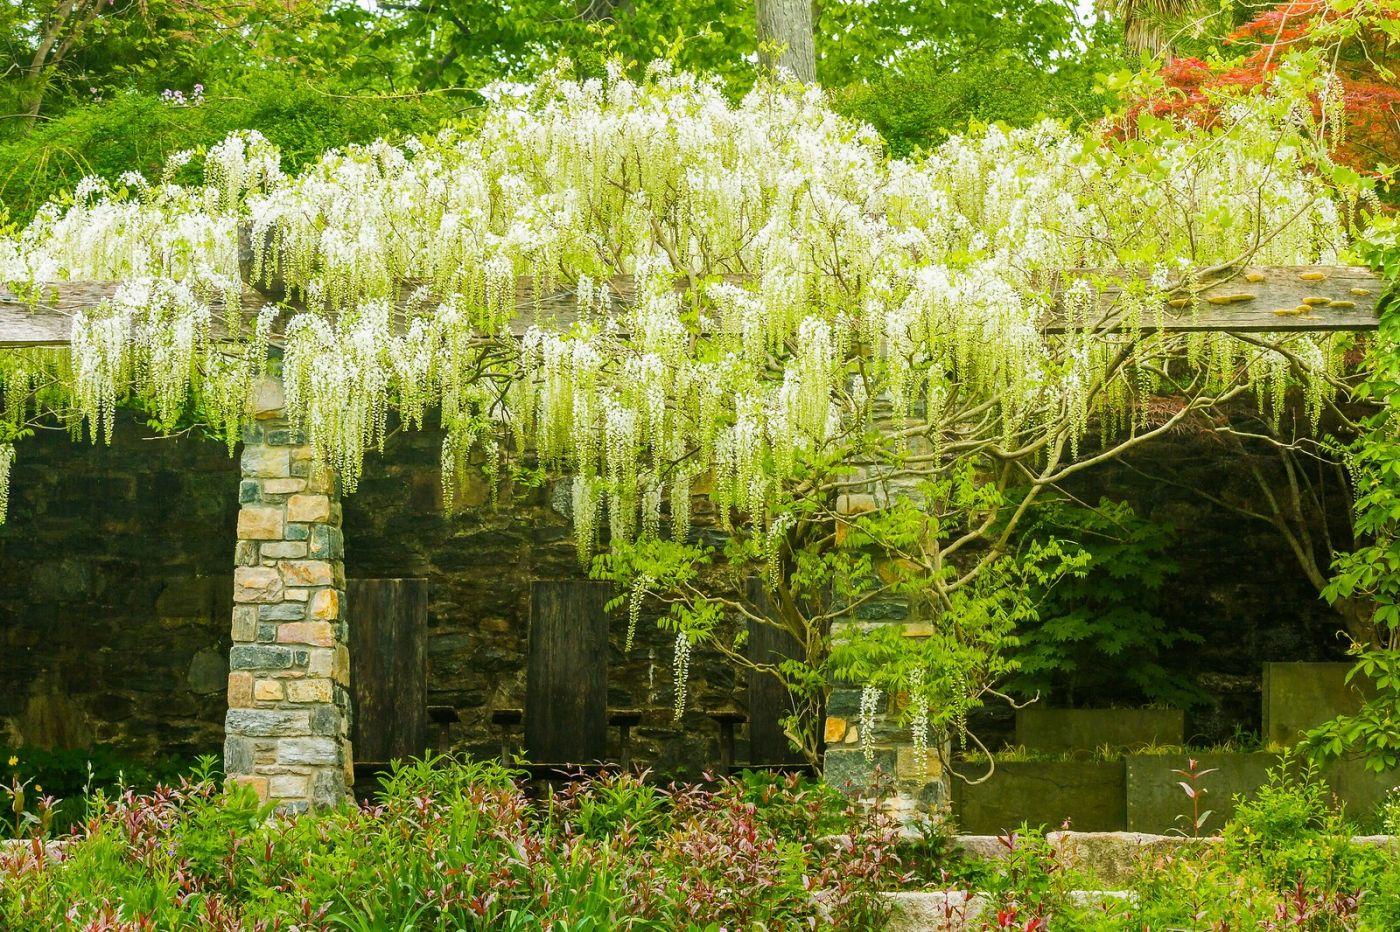 Chanticleer花园,那年盛开的紫藤花_图1-33